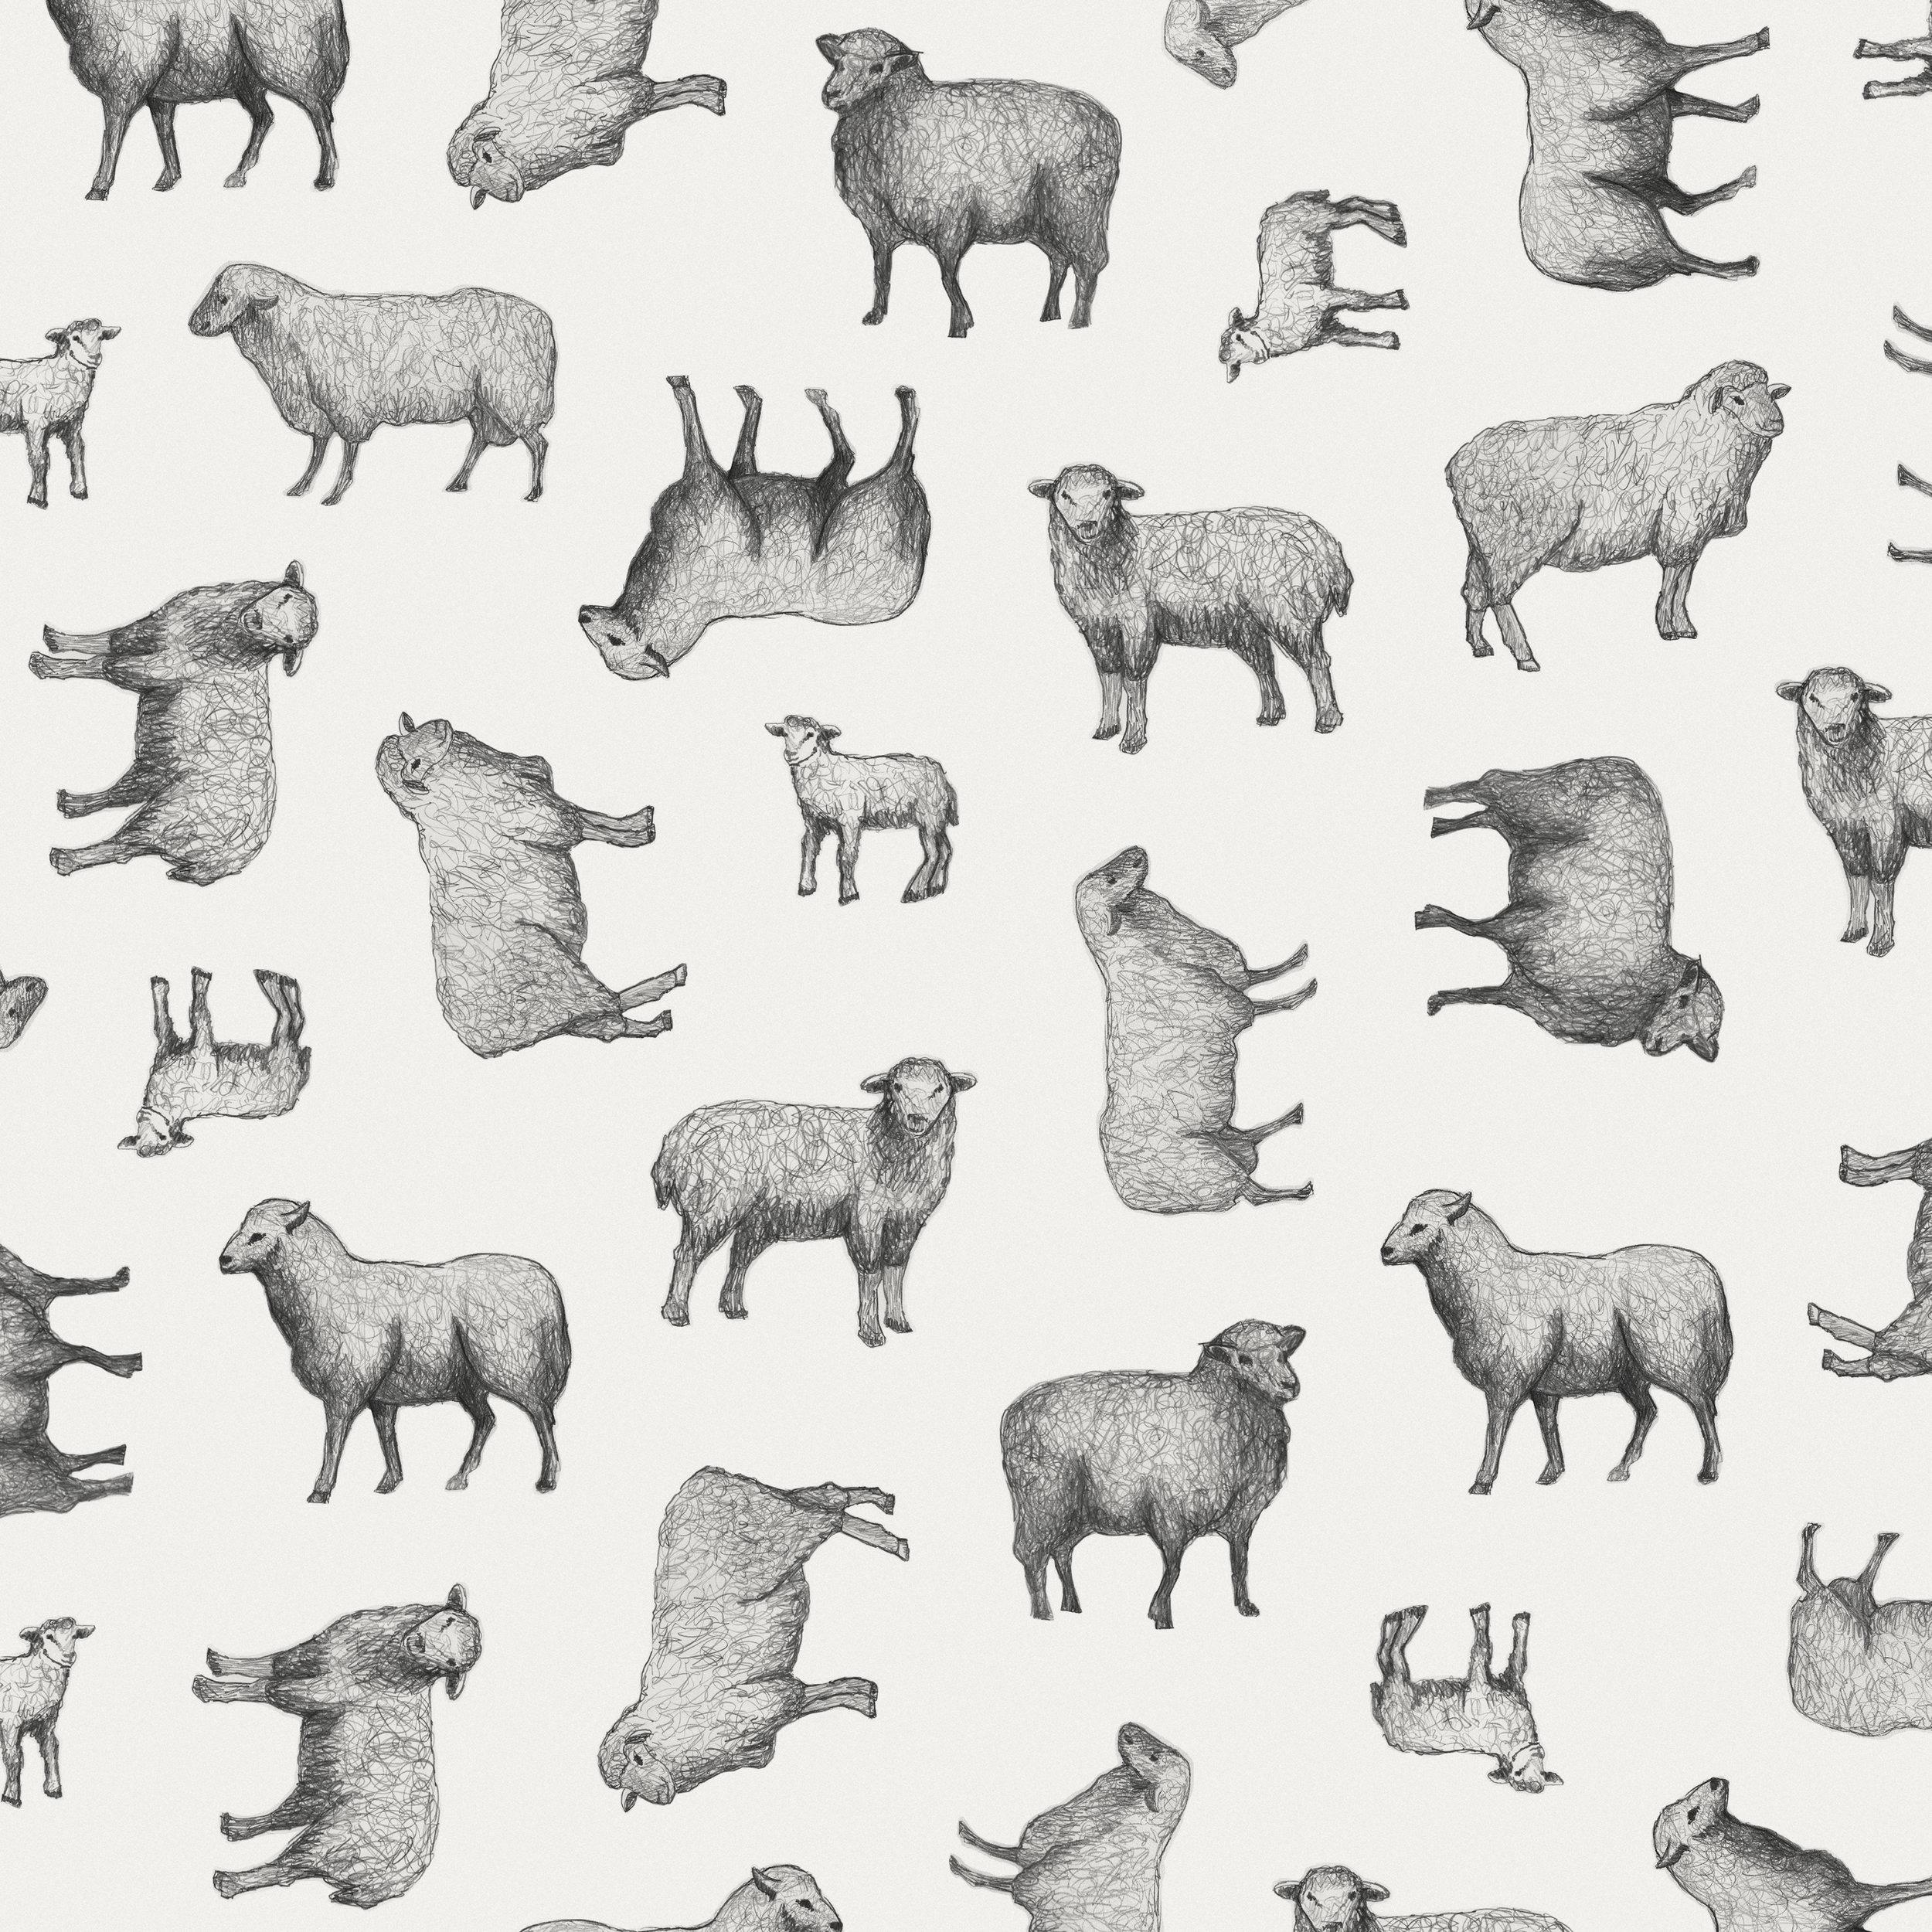 sheep-illustration-pattern.jpg